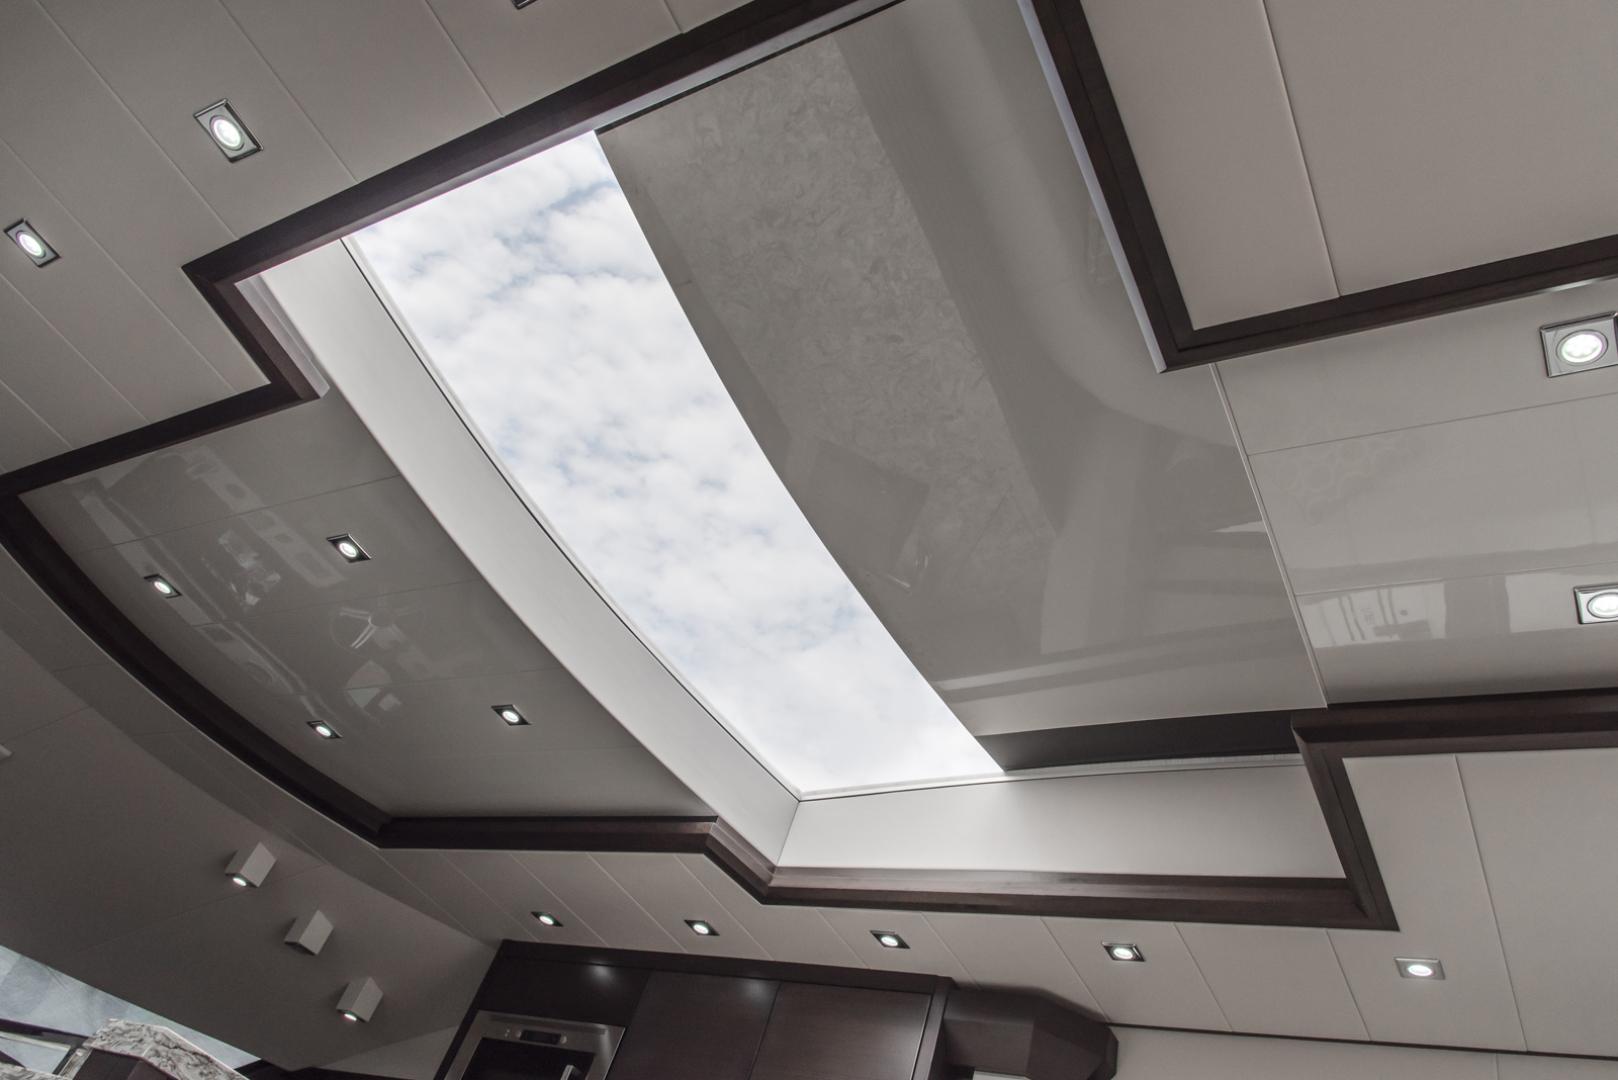 Neptunus-Motor Yacht Express 2018-LIQUID WISDOM Grand Haven-Michigan-United States-Salon sunroof-1484959 | Thumbnail